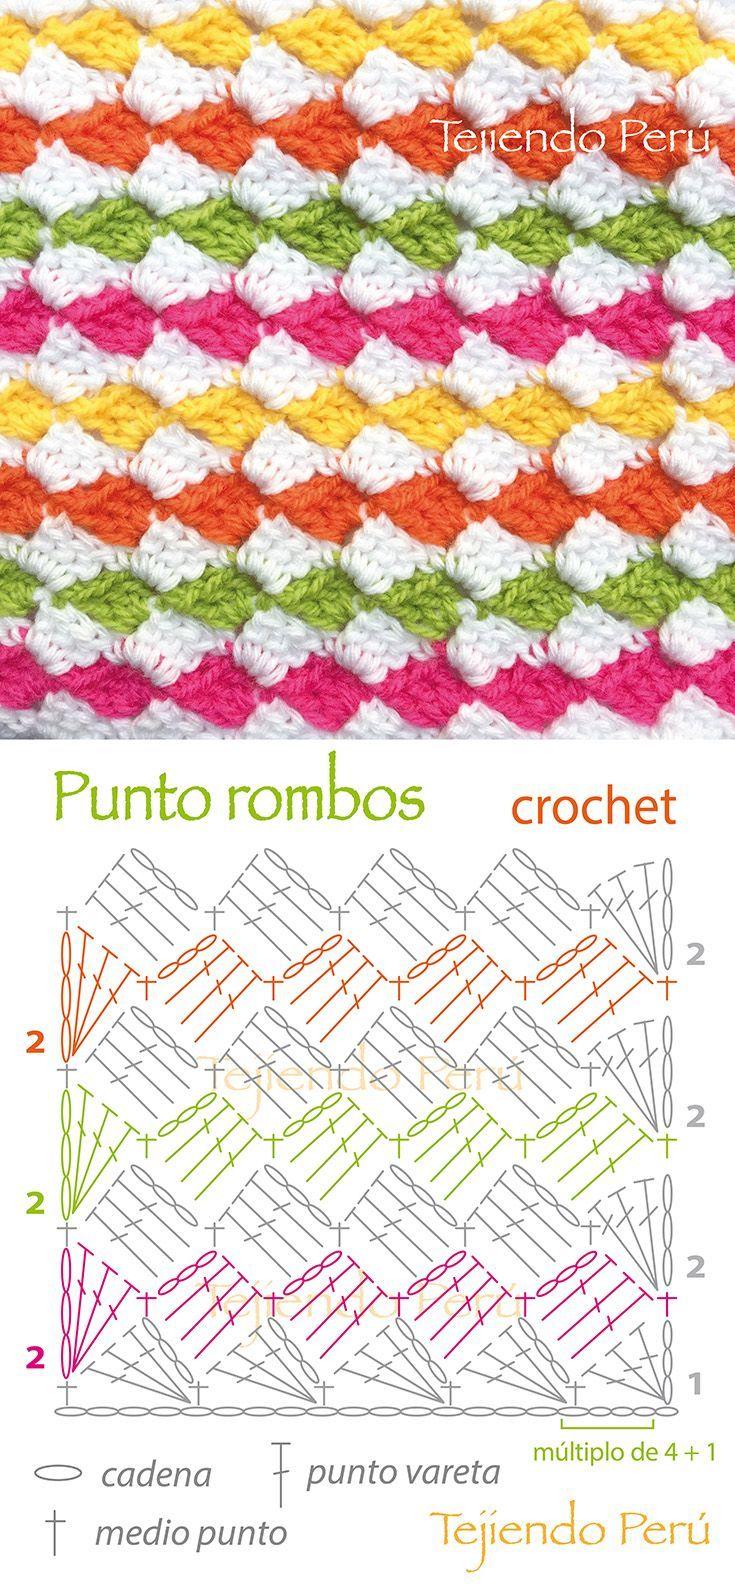 Image result for tejiendo peru pom pom quilt | HÄKELN | Pinterest ...